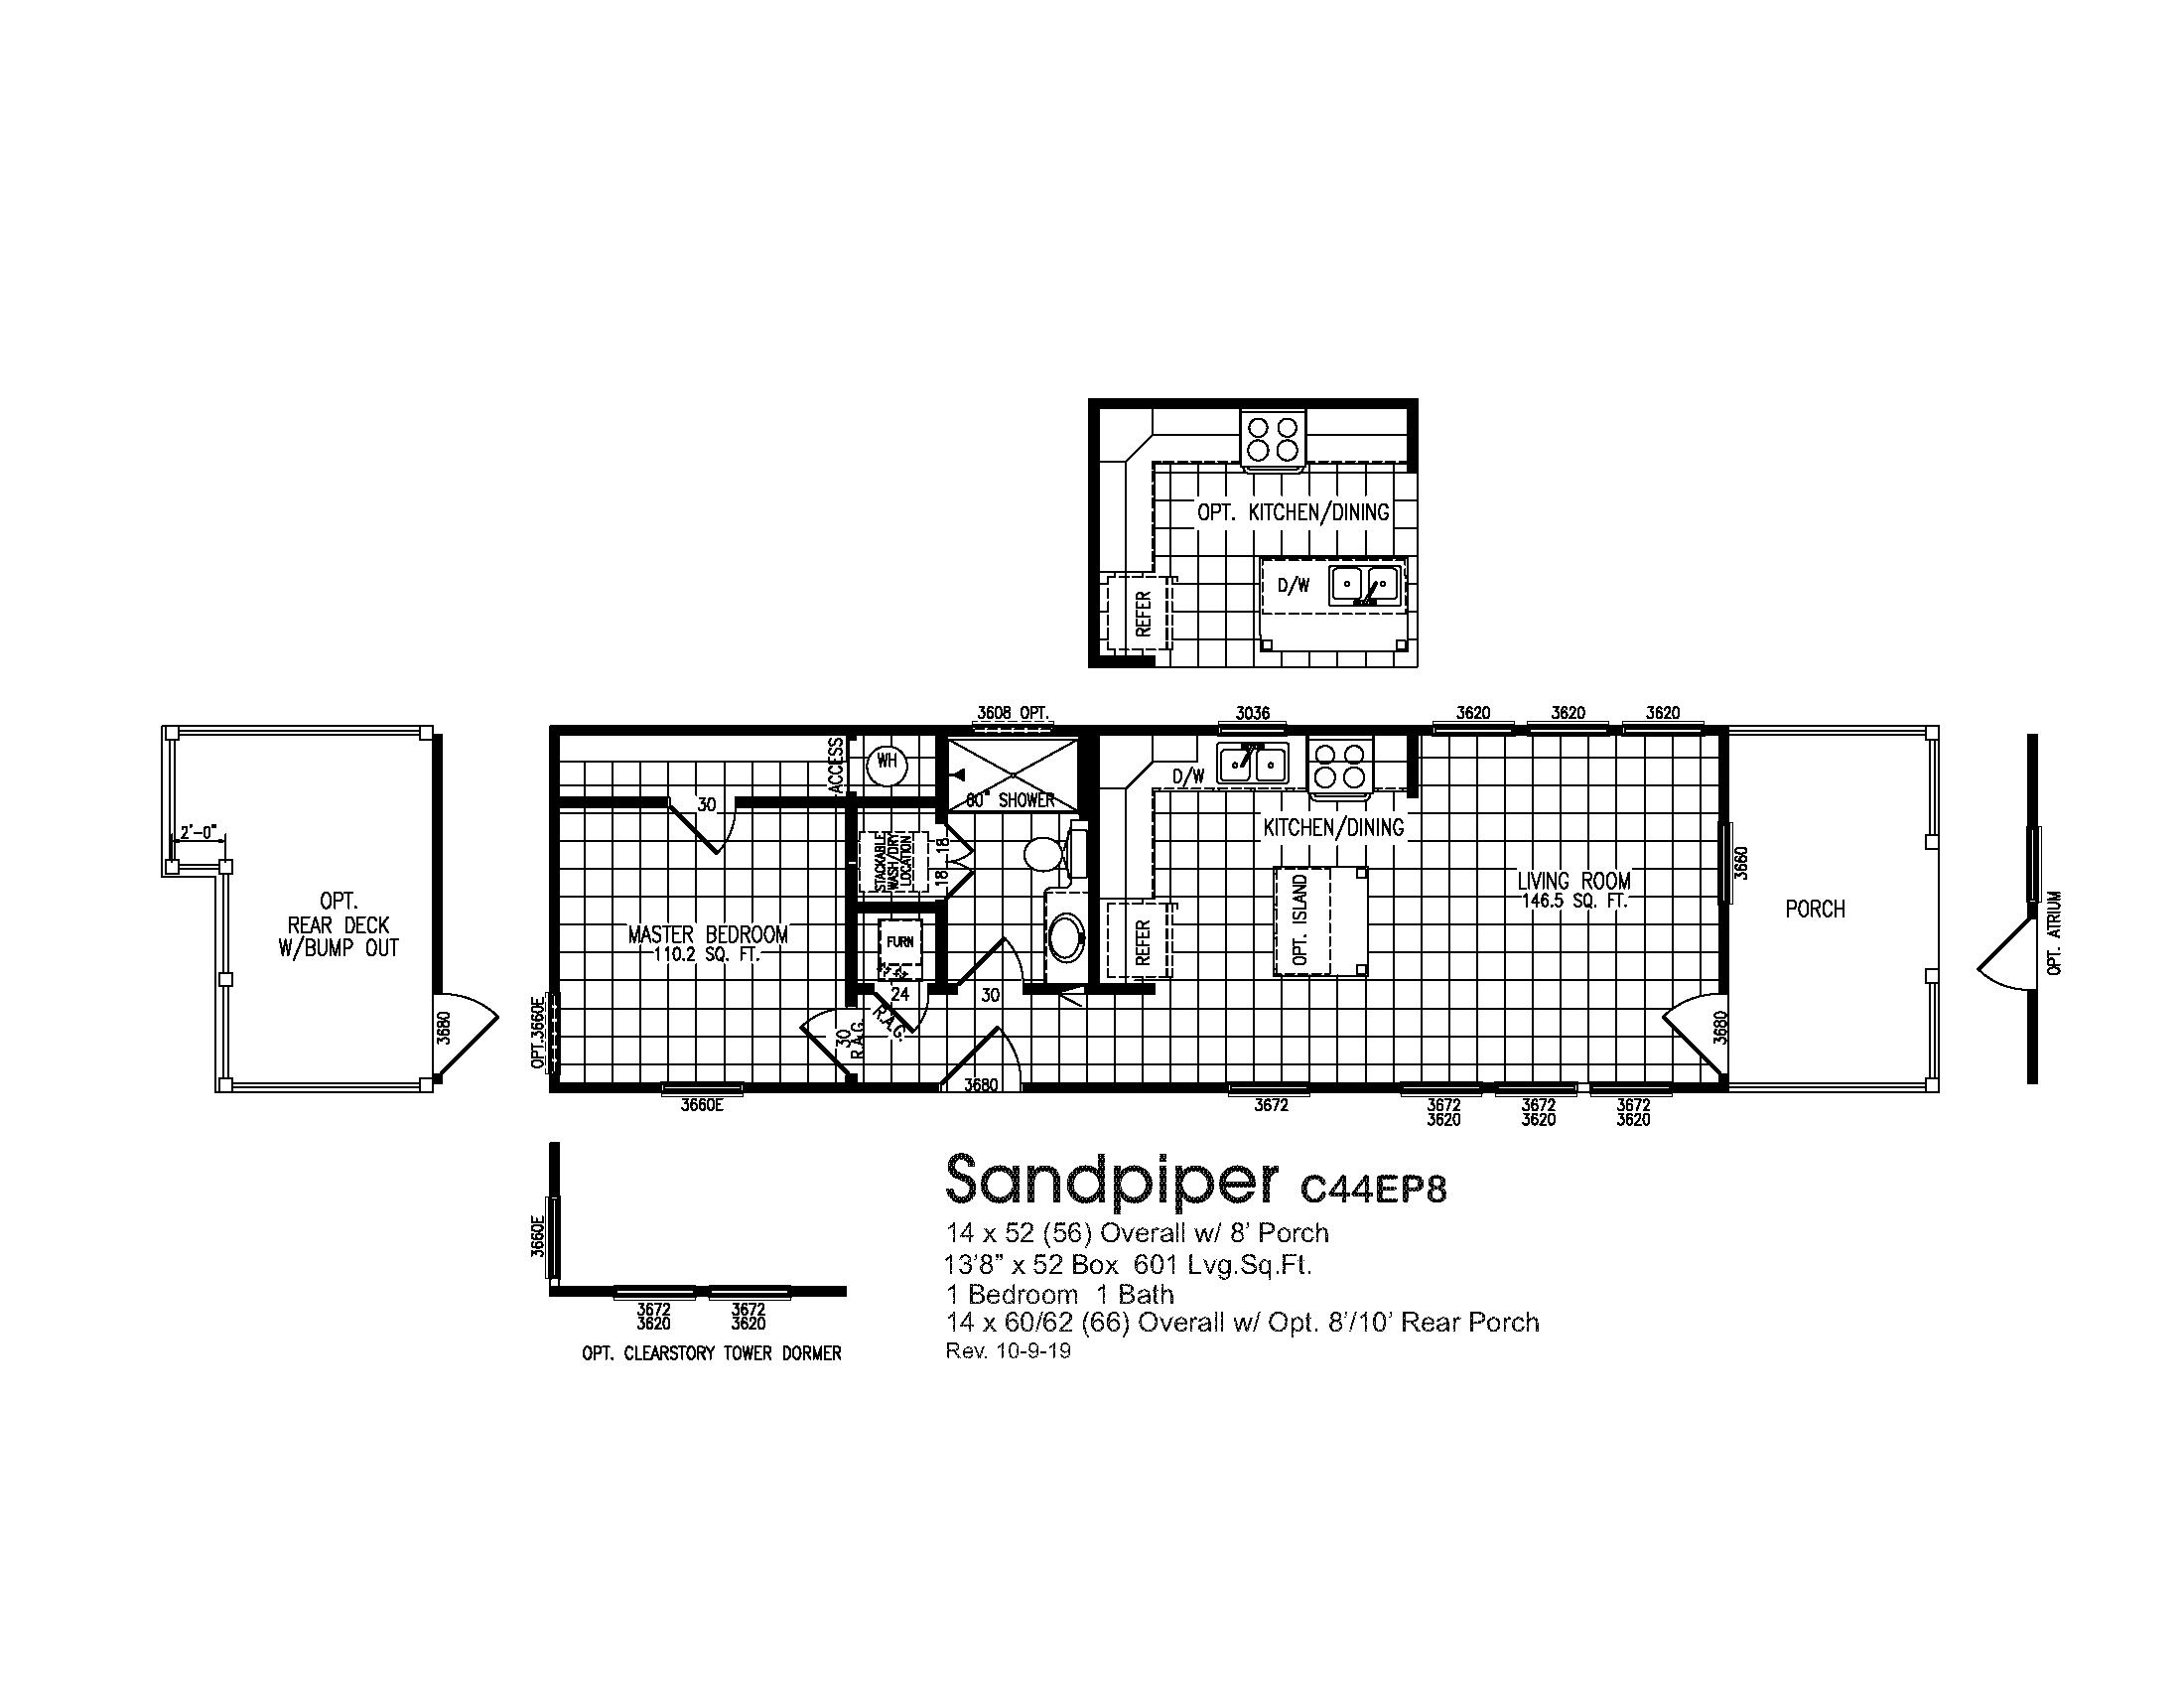 Smart Cottage Sandpiper C44EP8 Floorplan